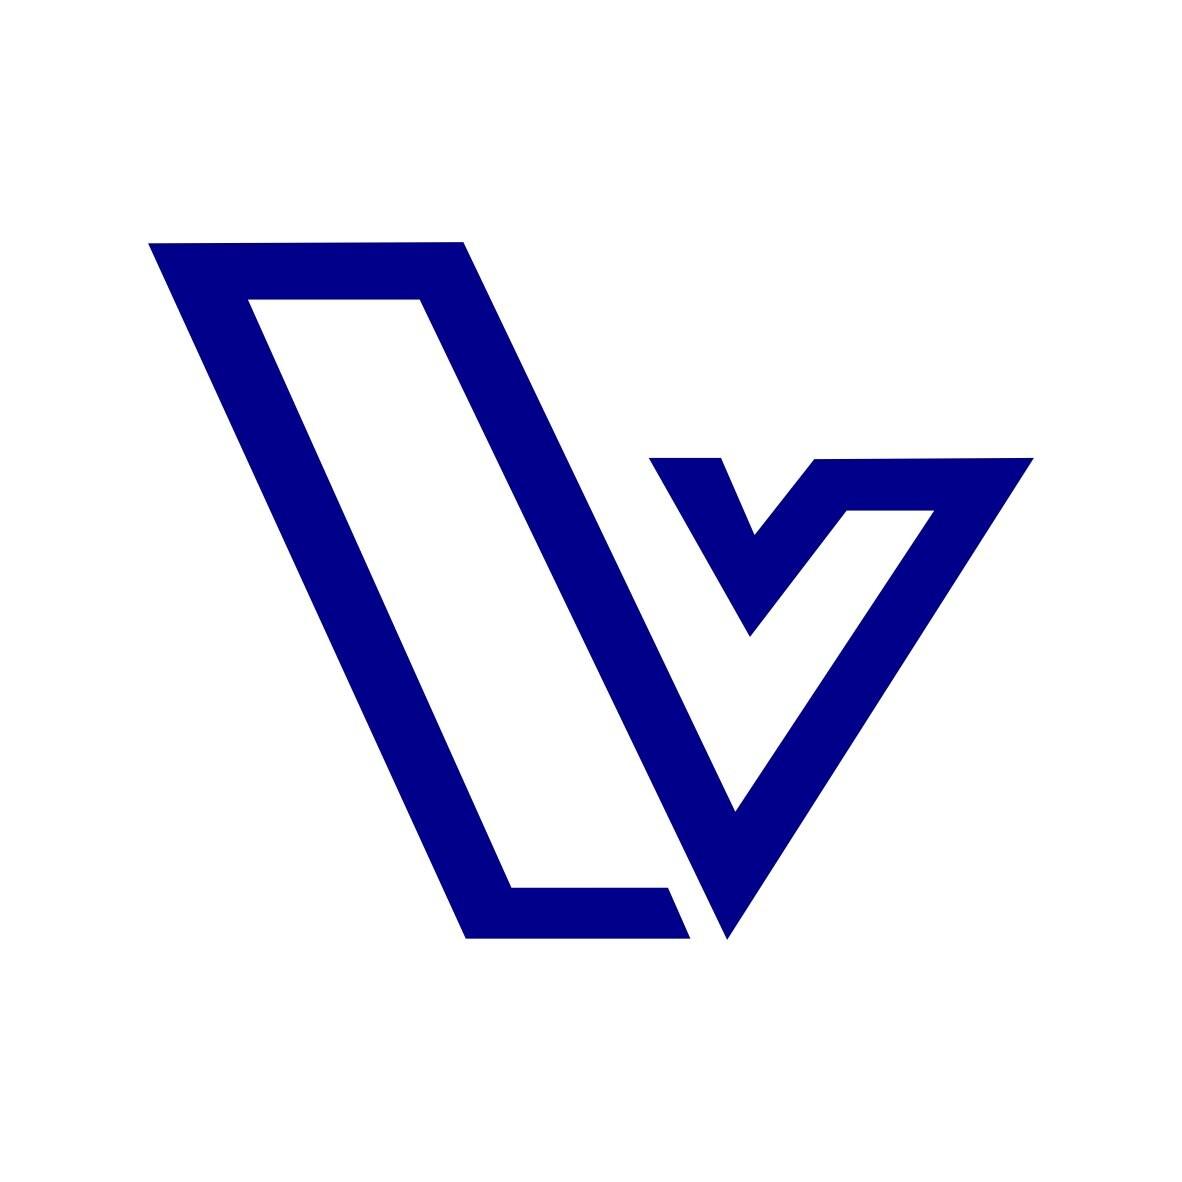 Lytical Ventures